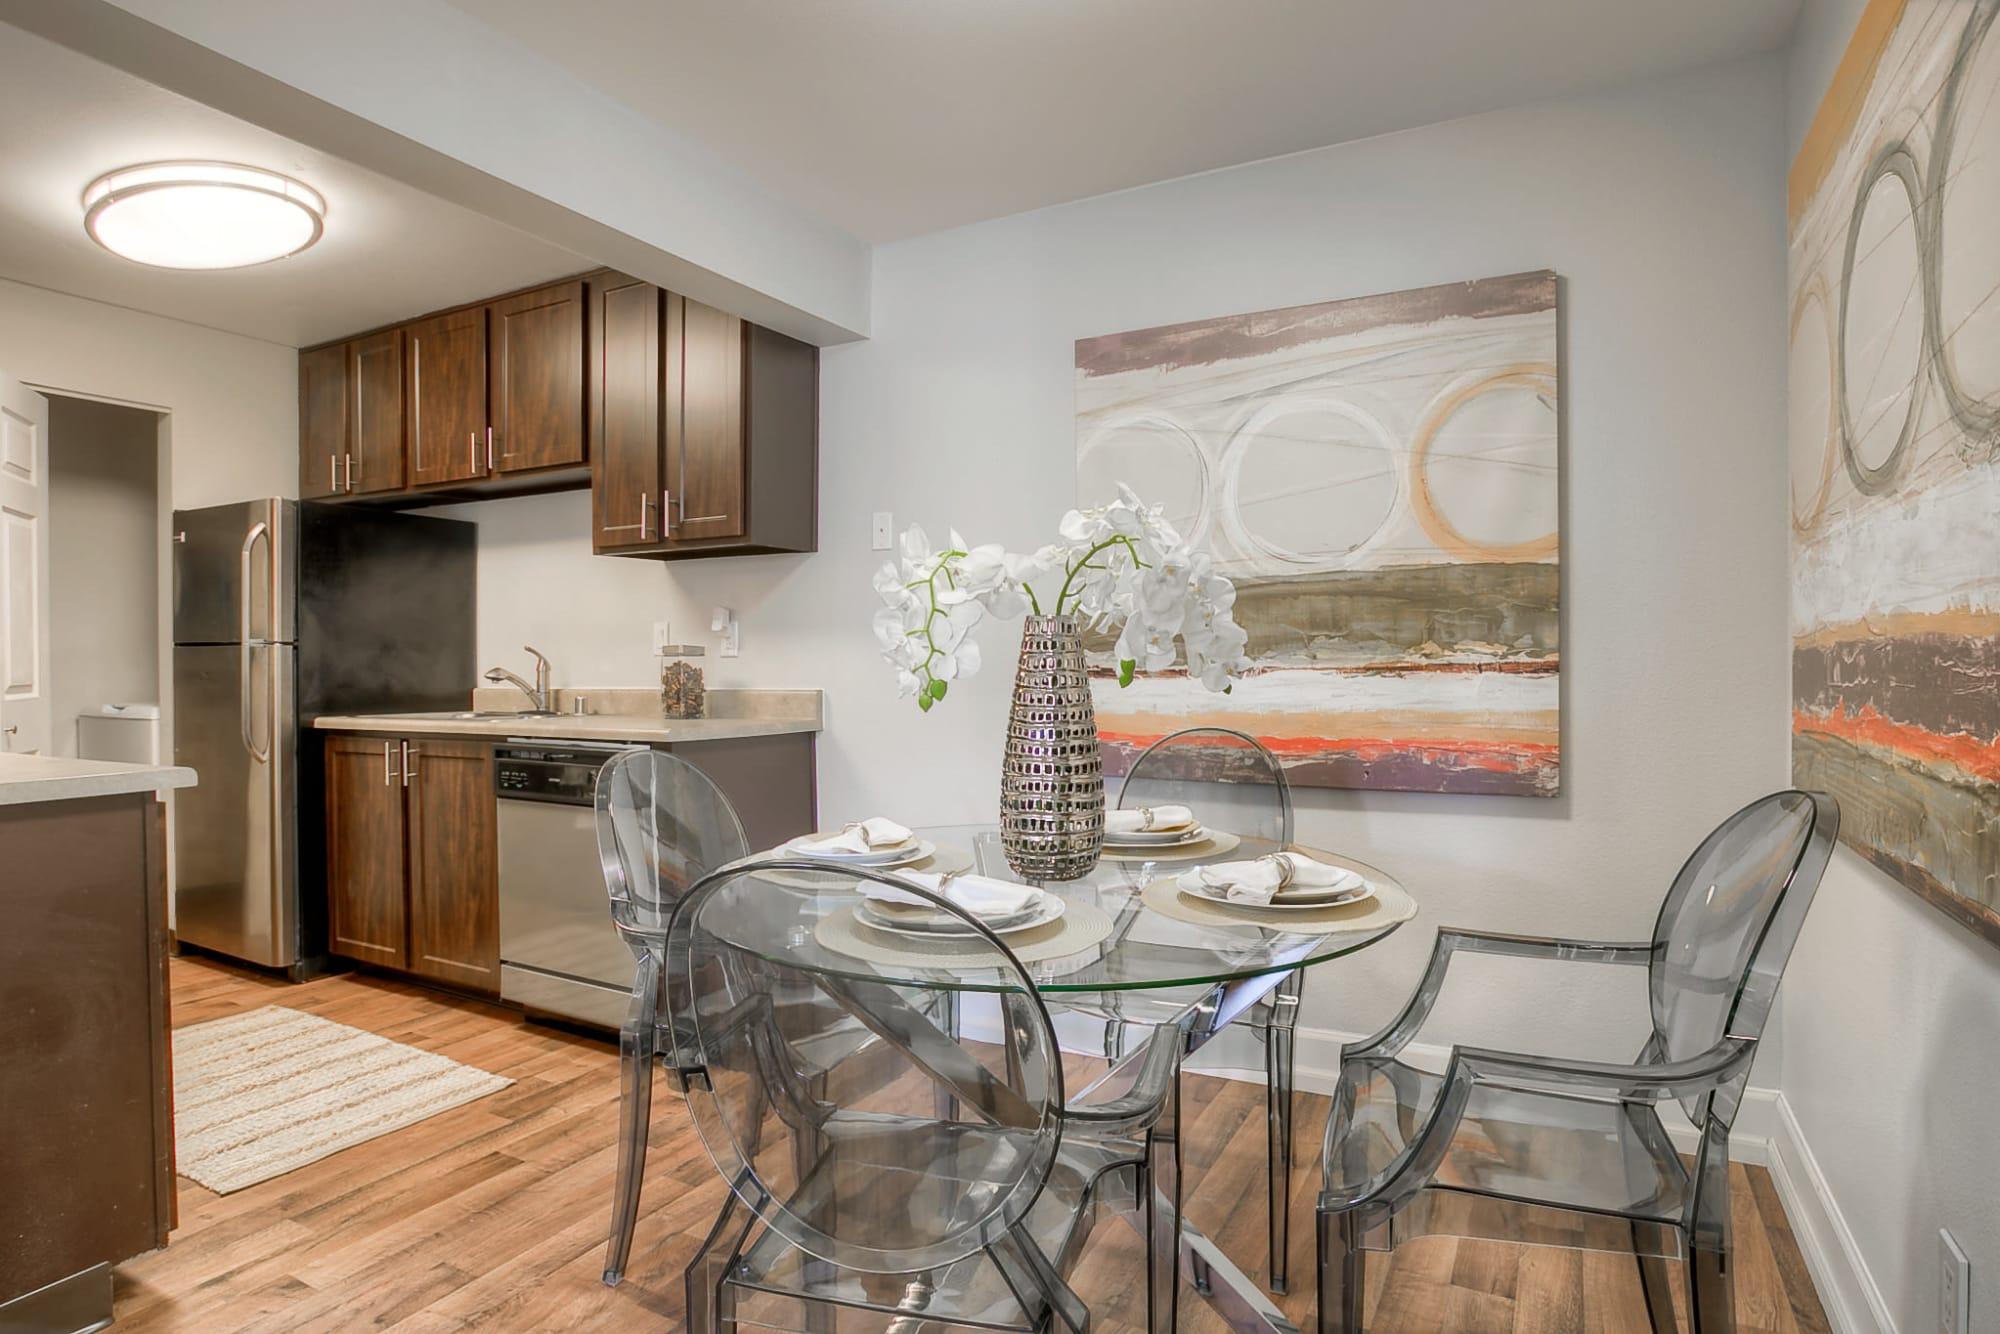 Kitchen at Newport Crossing Apartments